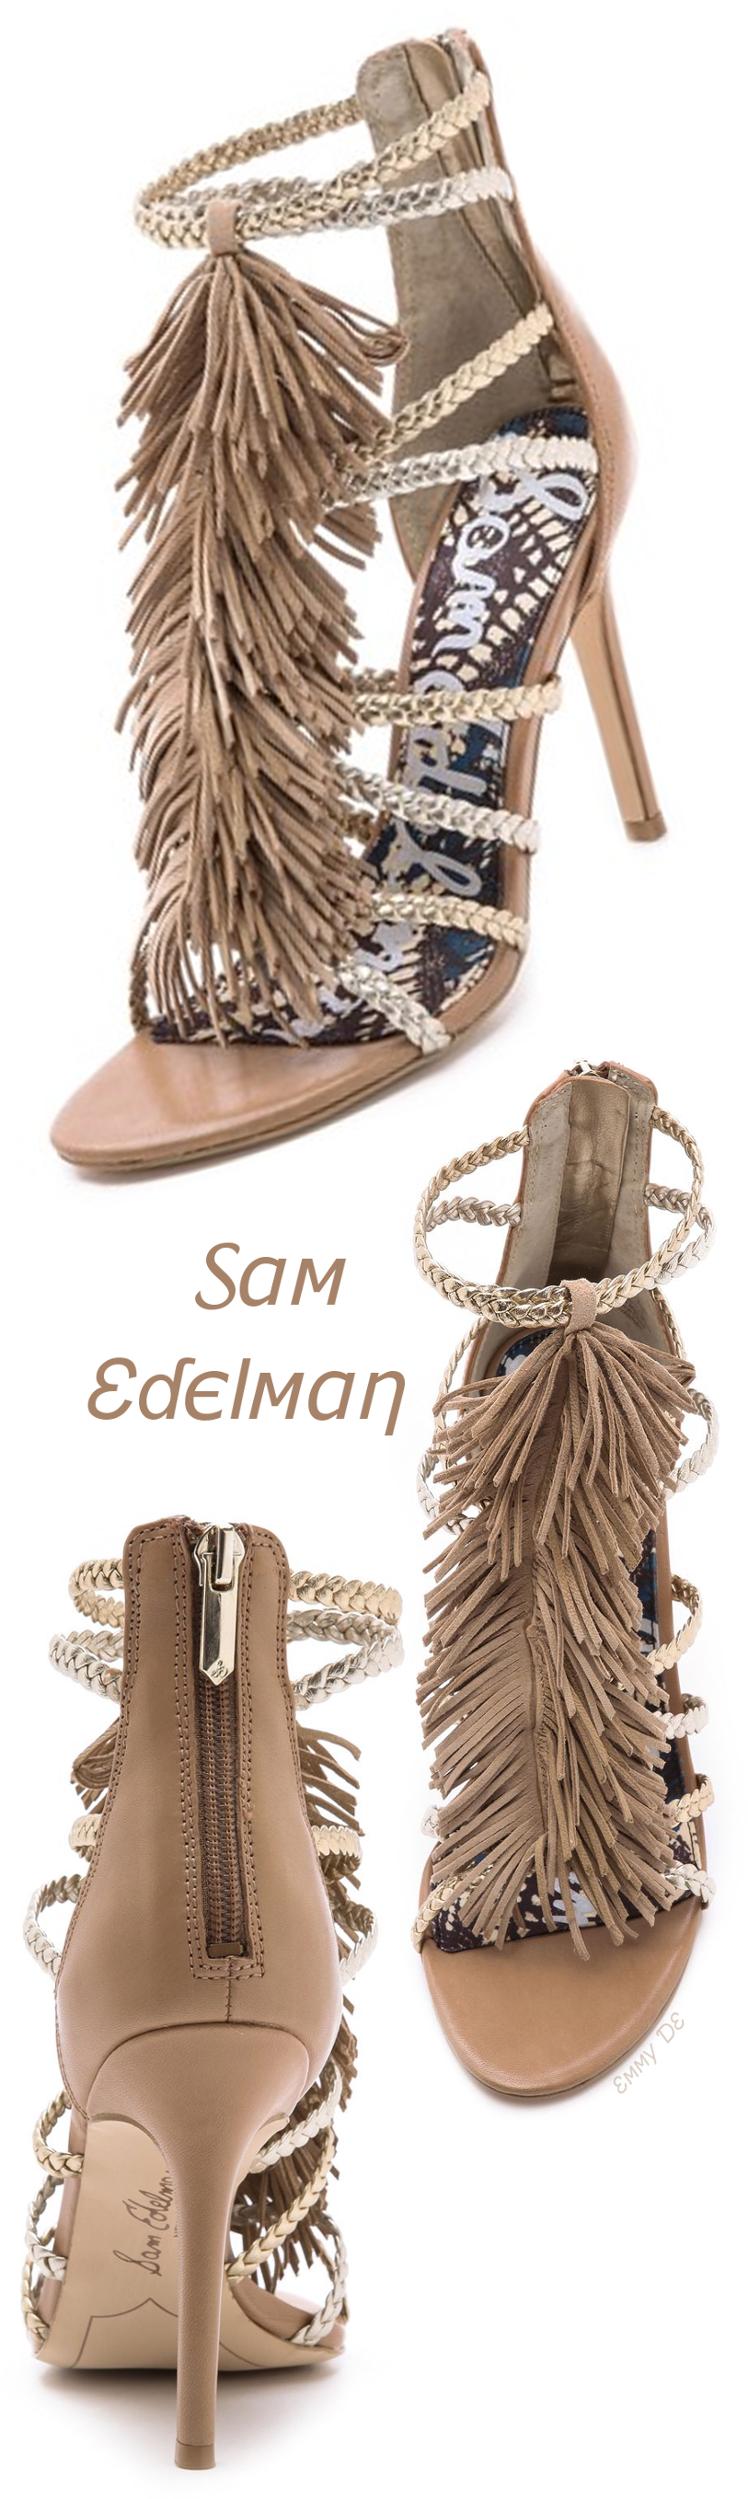 d223388f62f2 Emmy DE   Sam Edelman Savannah Fringe Gladiator Heels